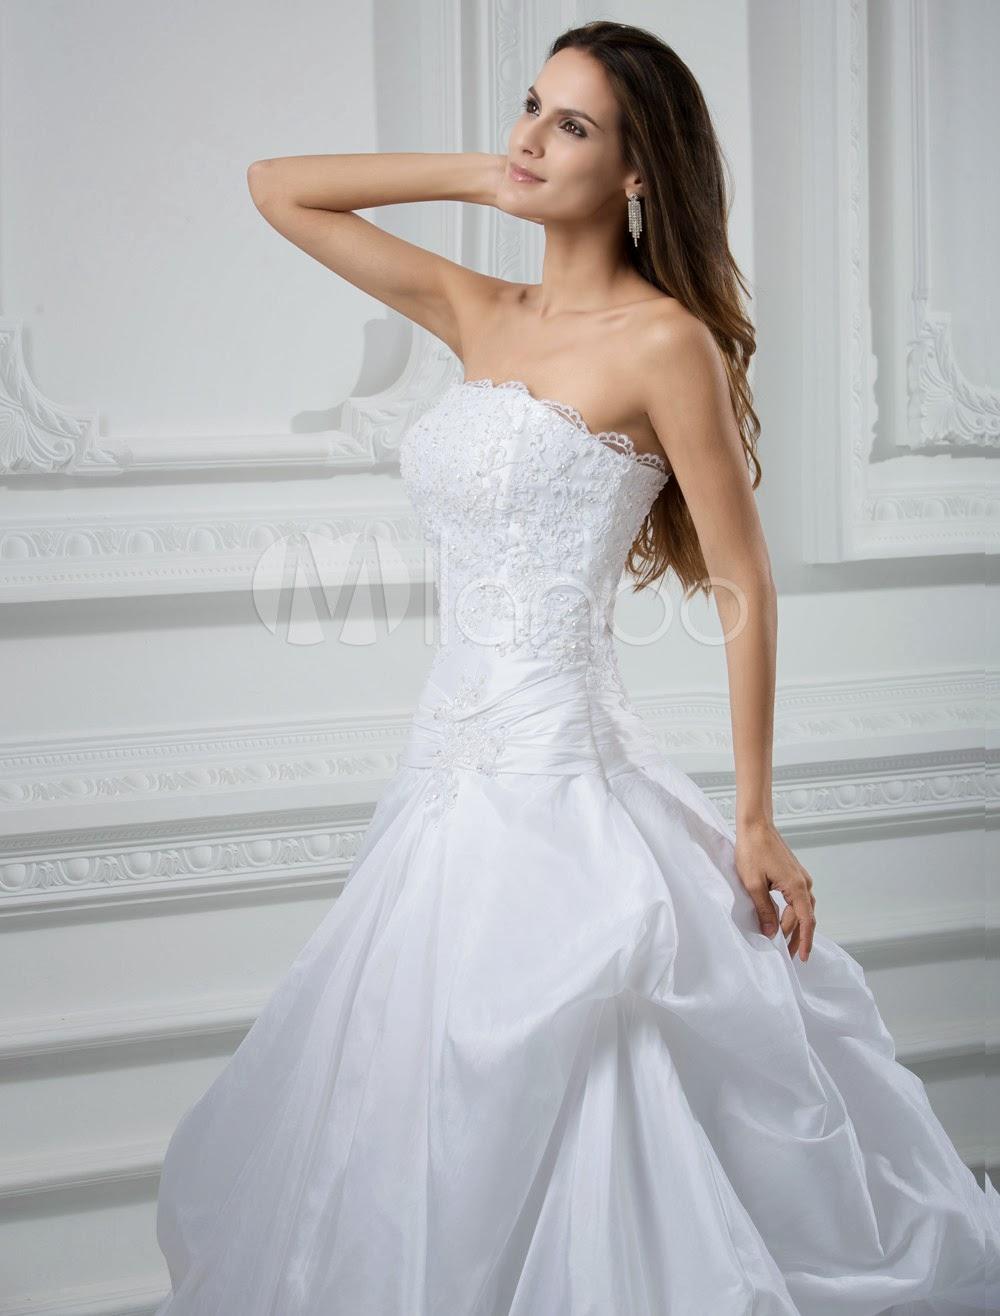 China Wholesale Dresses - Gorgeous A-line Strapless Beading Pongee Wedding Dress